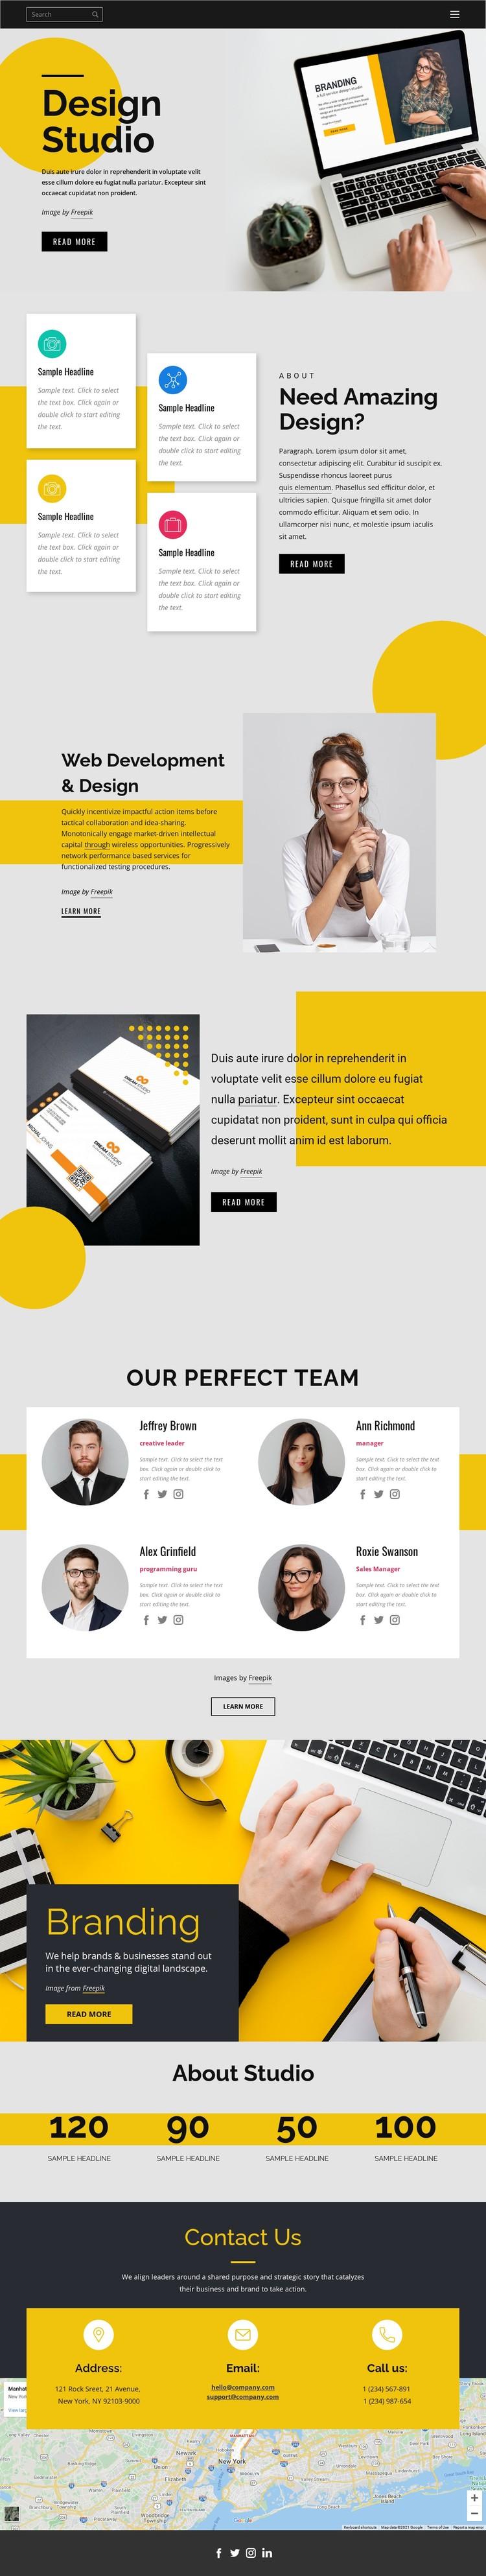 Brand, print & web design Static Site Generator